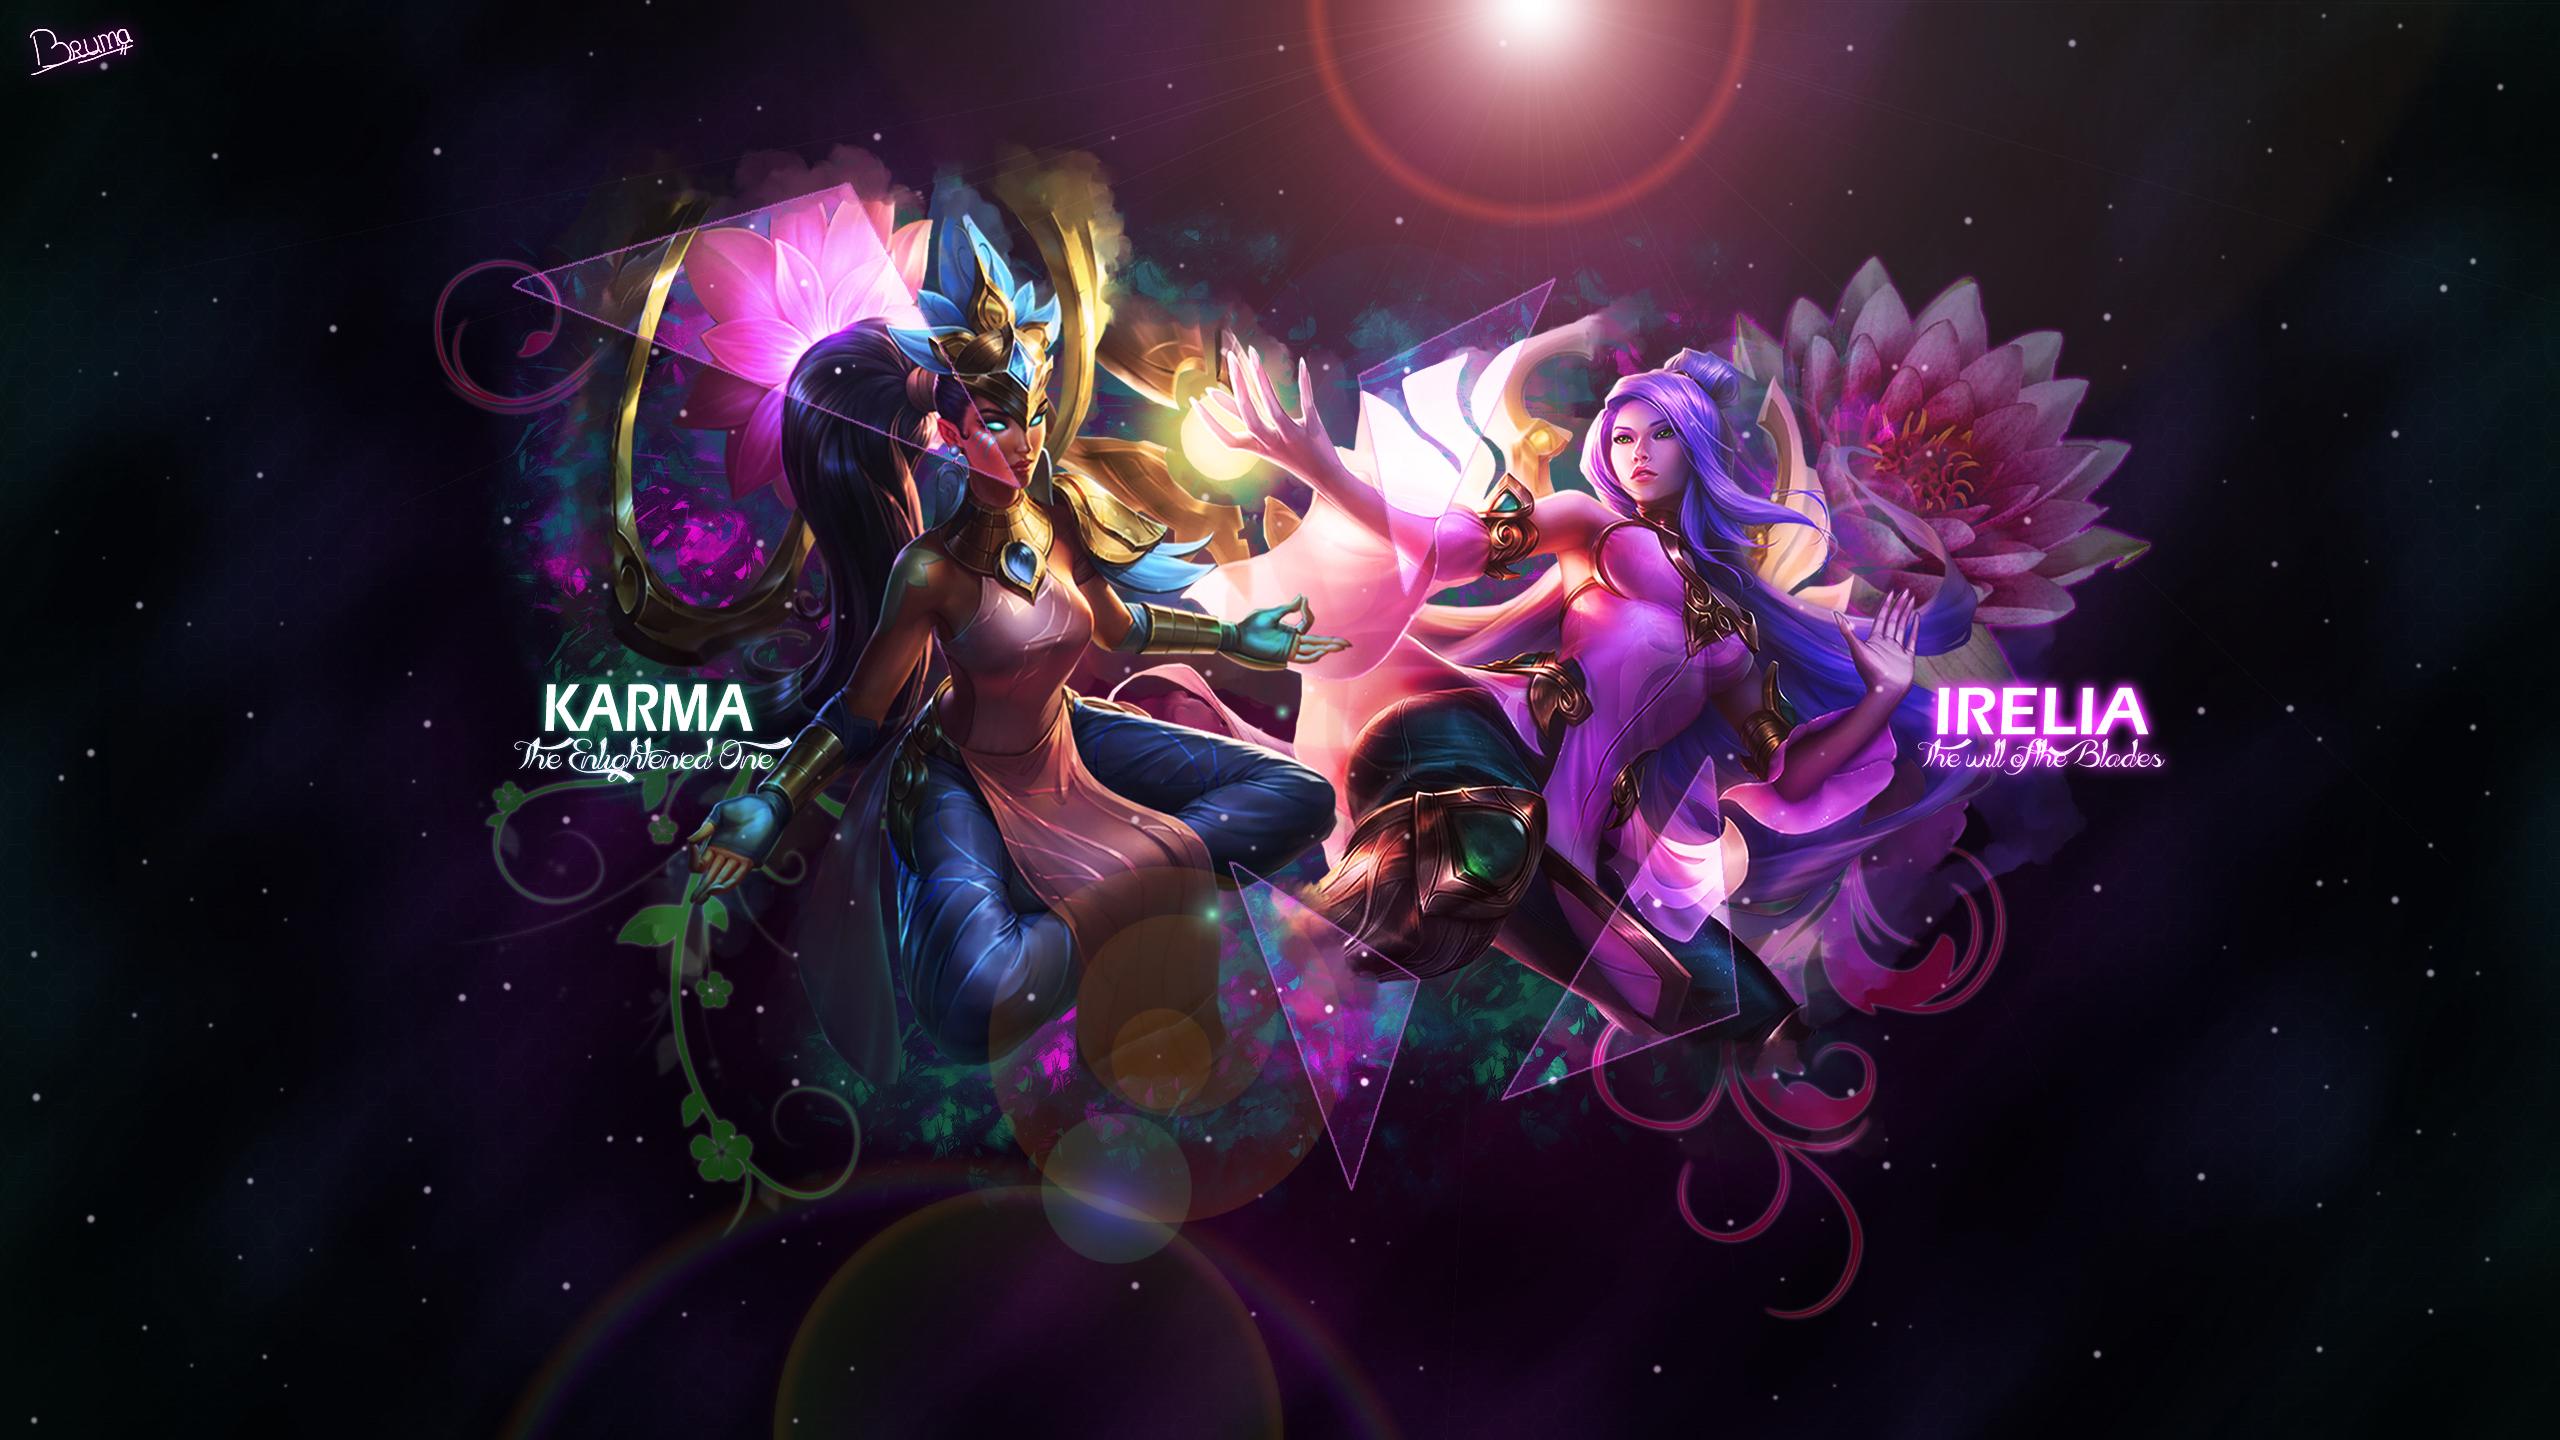 Order of The Lotus Karma & Irelia wallpaper